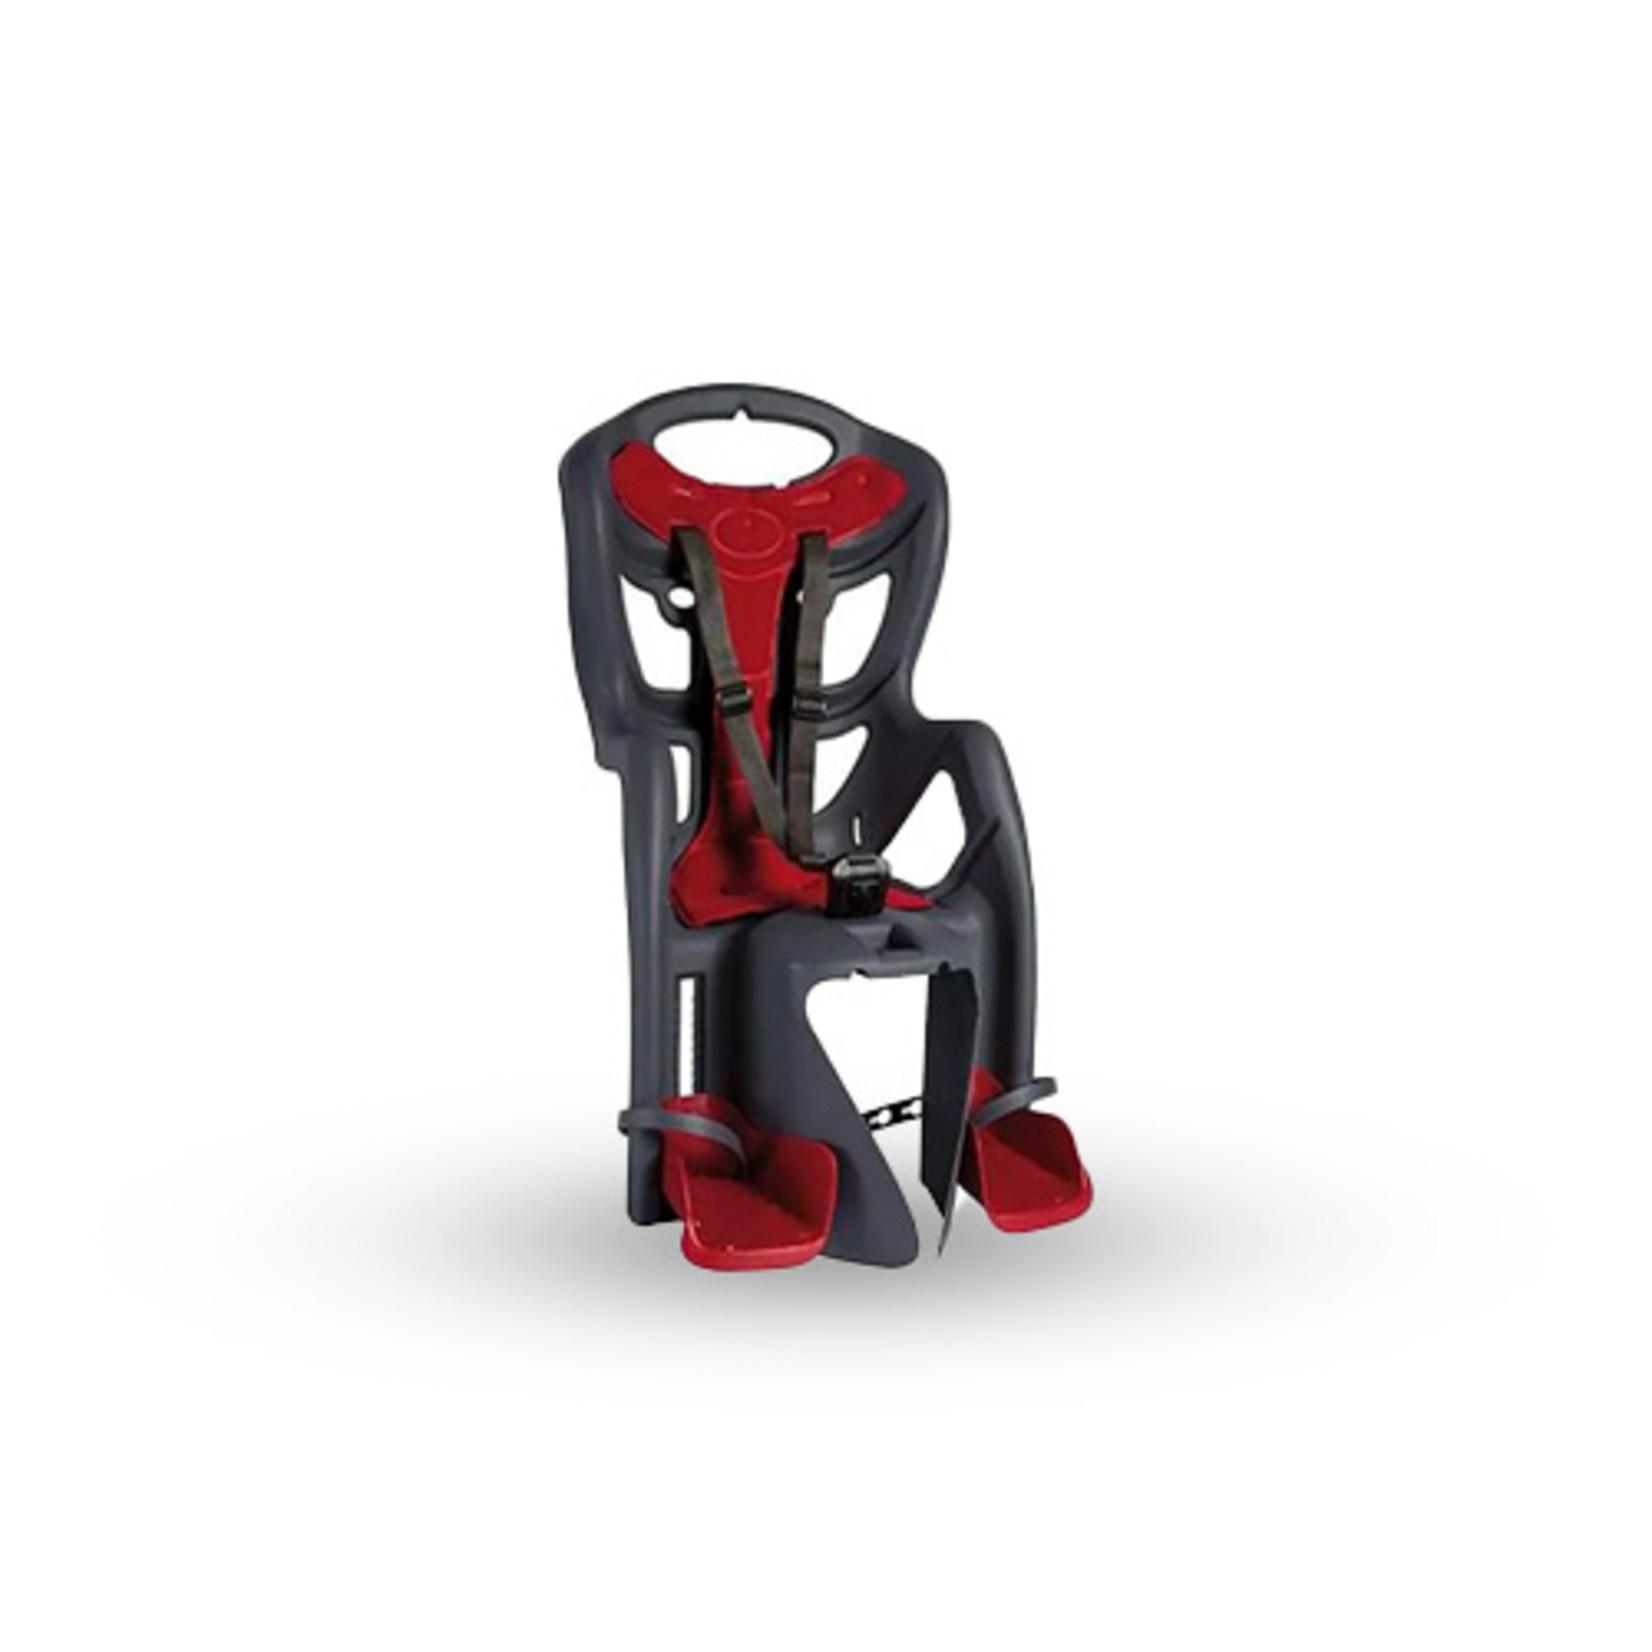 BELLELLI STANDARD BELLELLI CHILD SEAT